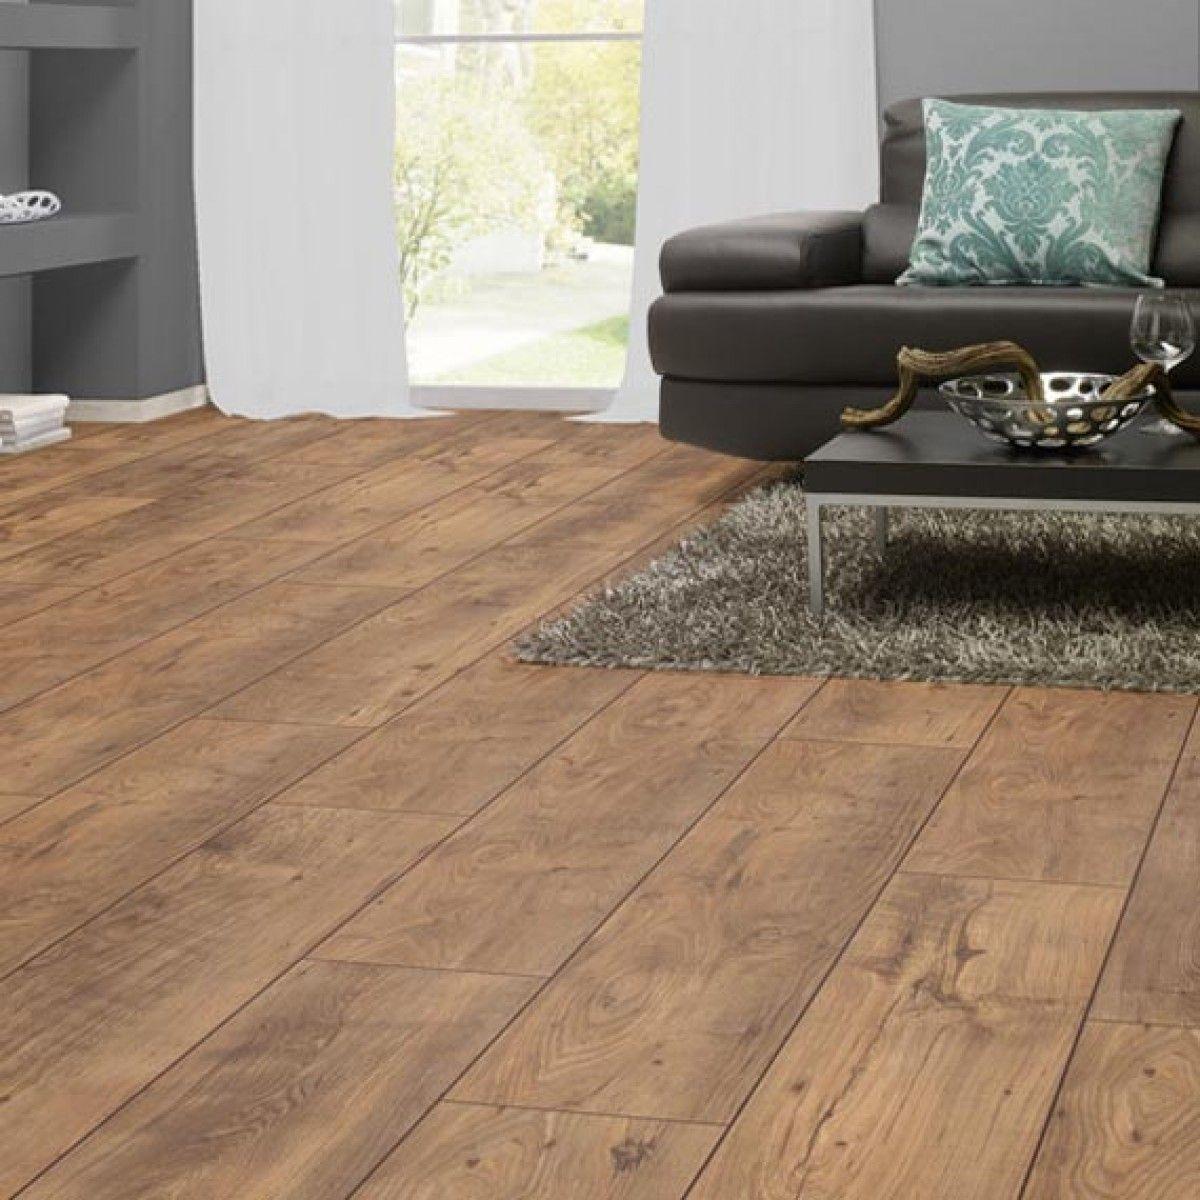 Contemporary Laminating Flooring Trends Yonohomedesign Com In